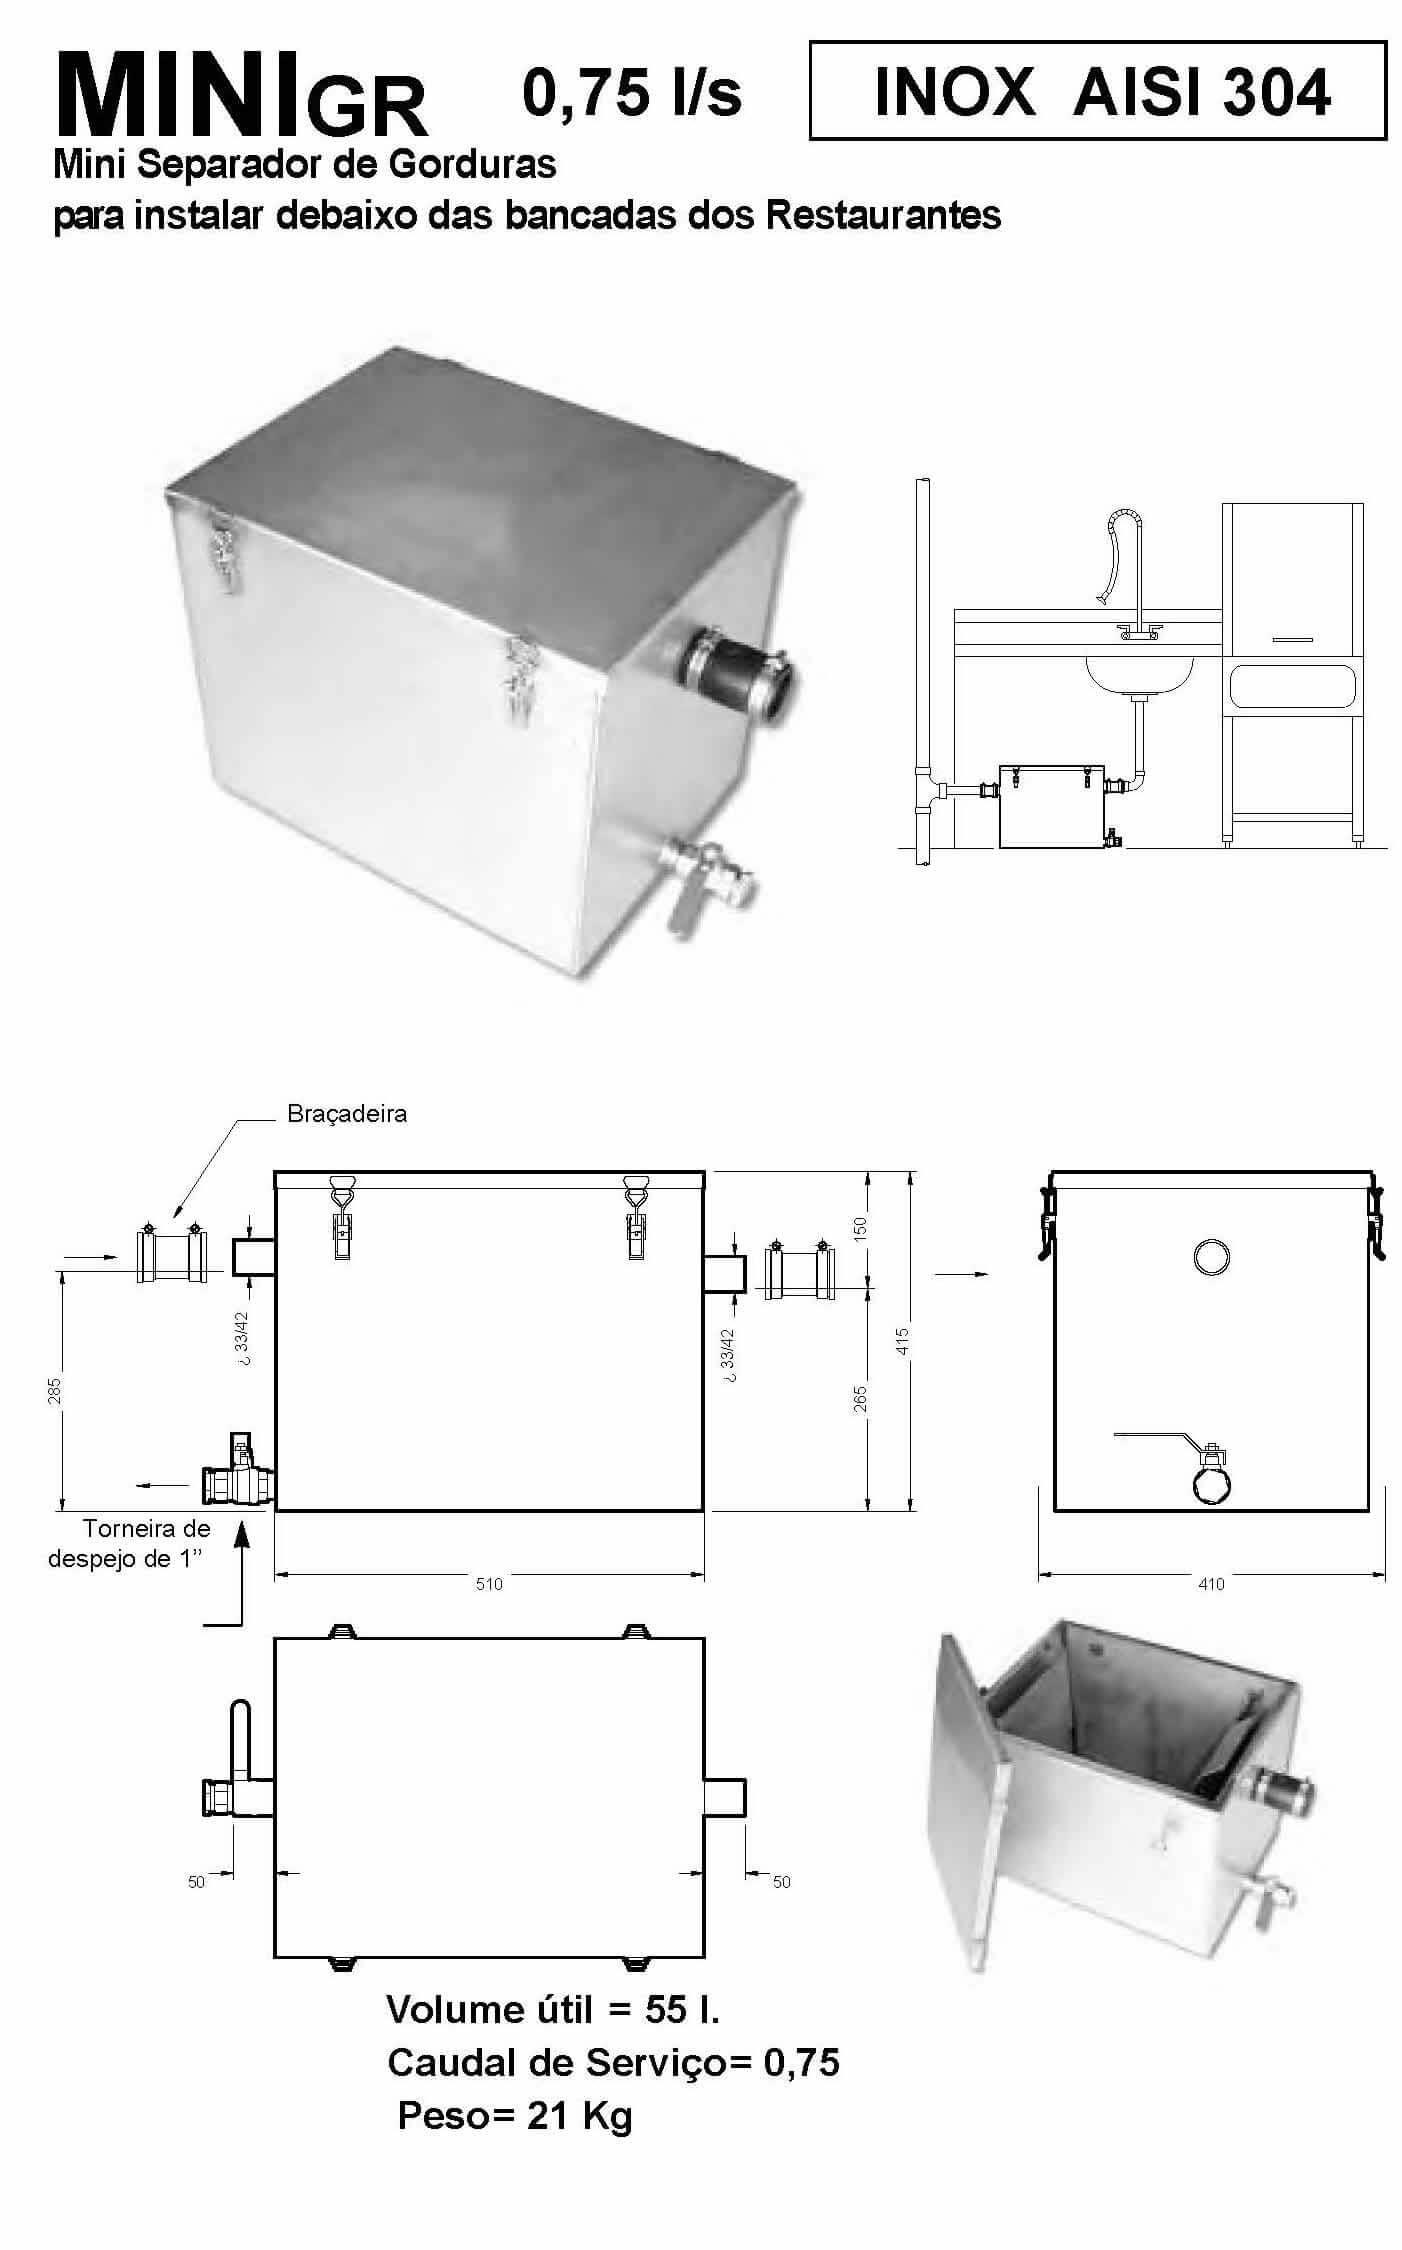 separador de gorduras compacto Separador de Gorduras Compacto Separador de Gorduras Compacto